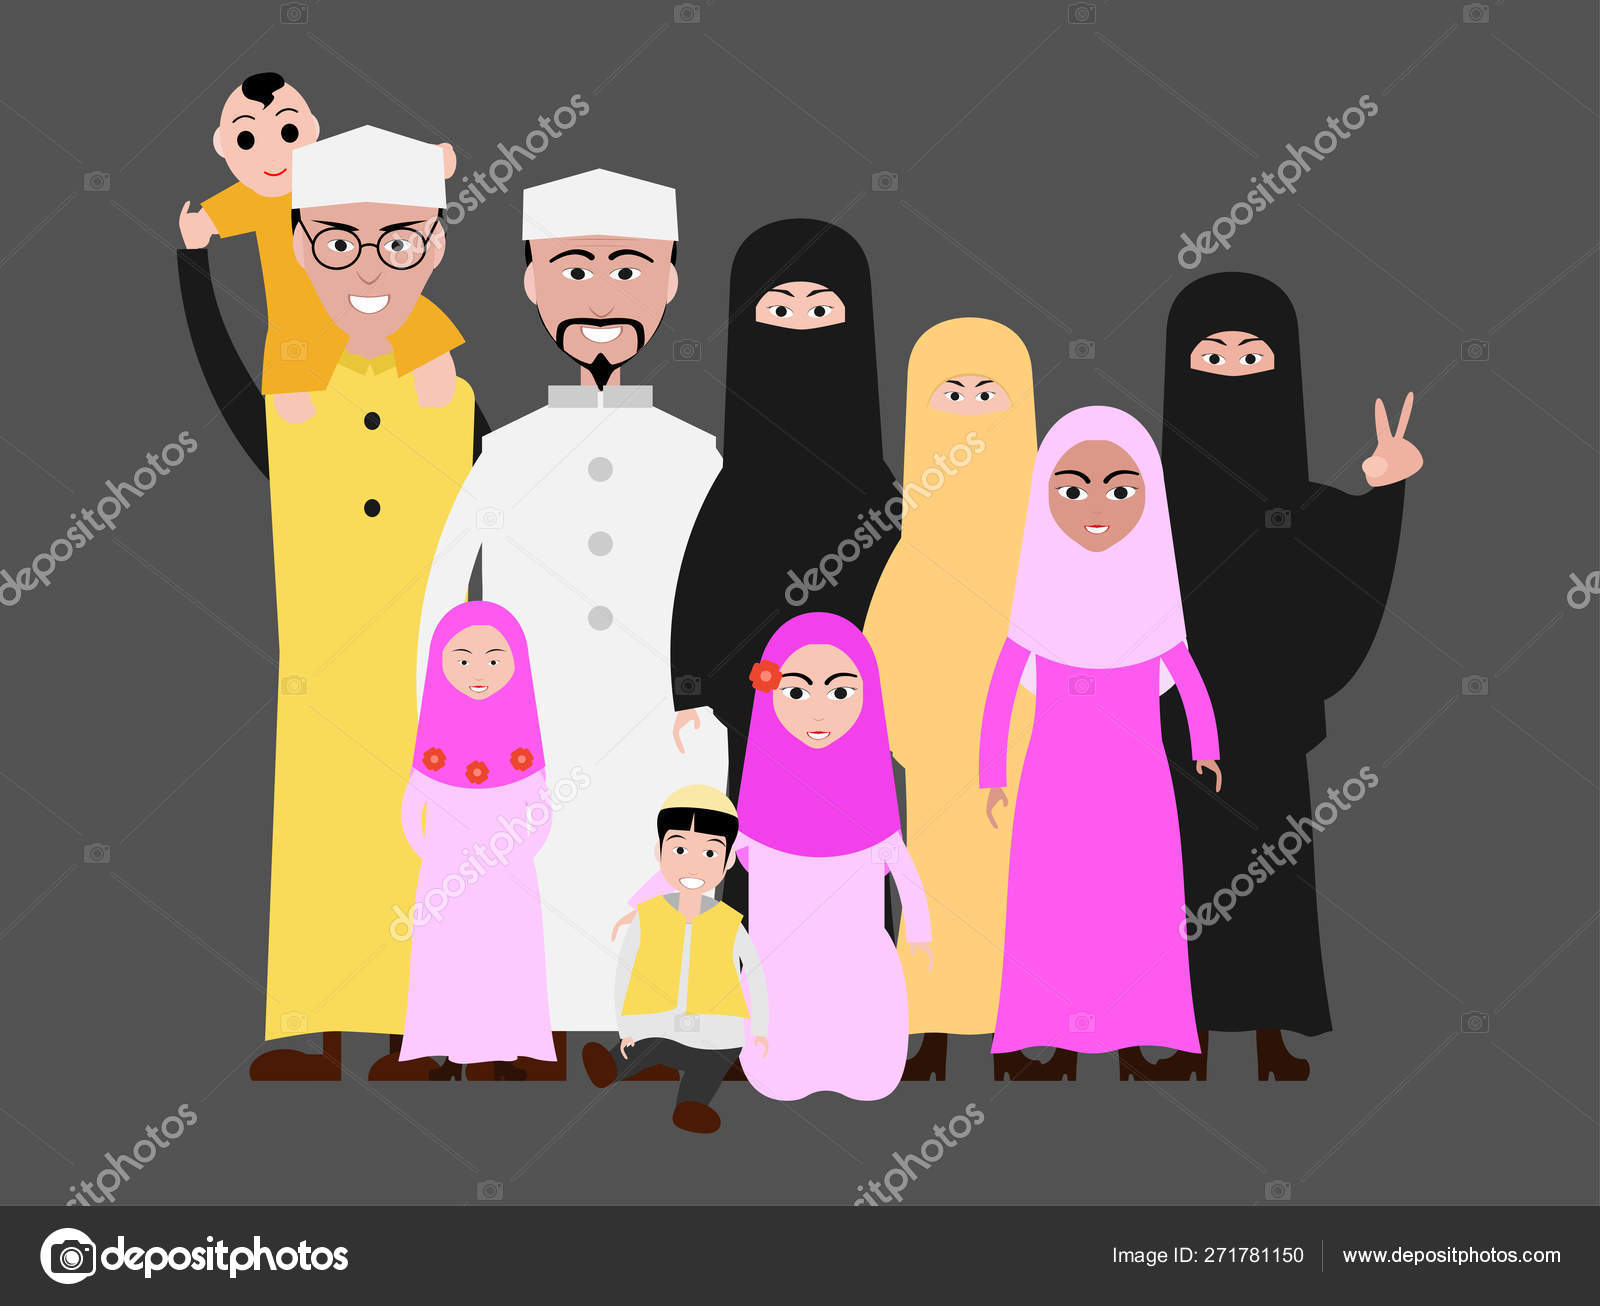 Muslim Family Cartoon Image Islamic Attire Stock Vector C Meenstockphoto Gmail Com 271781150